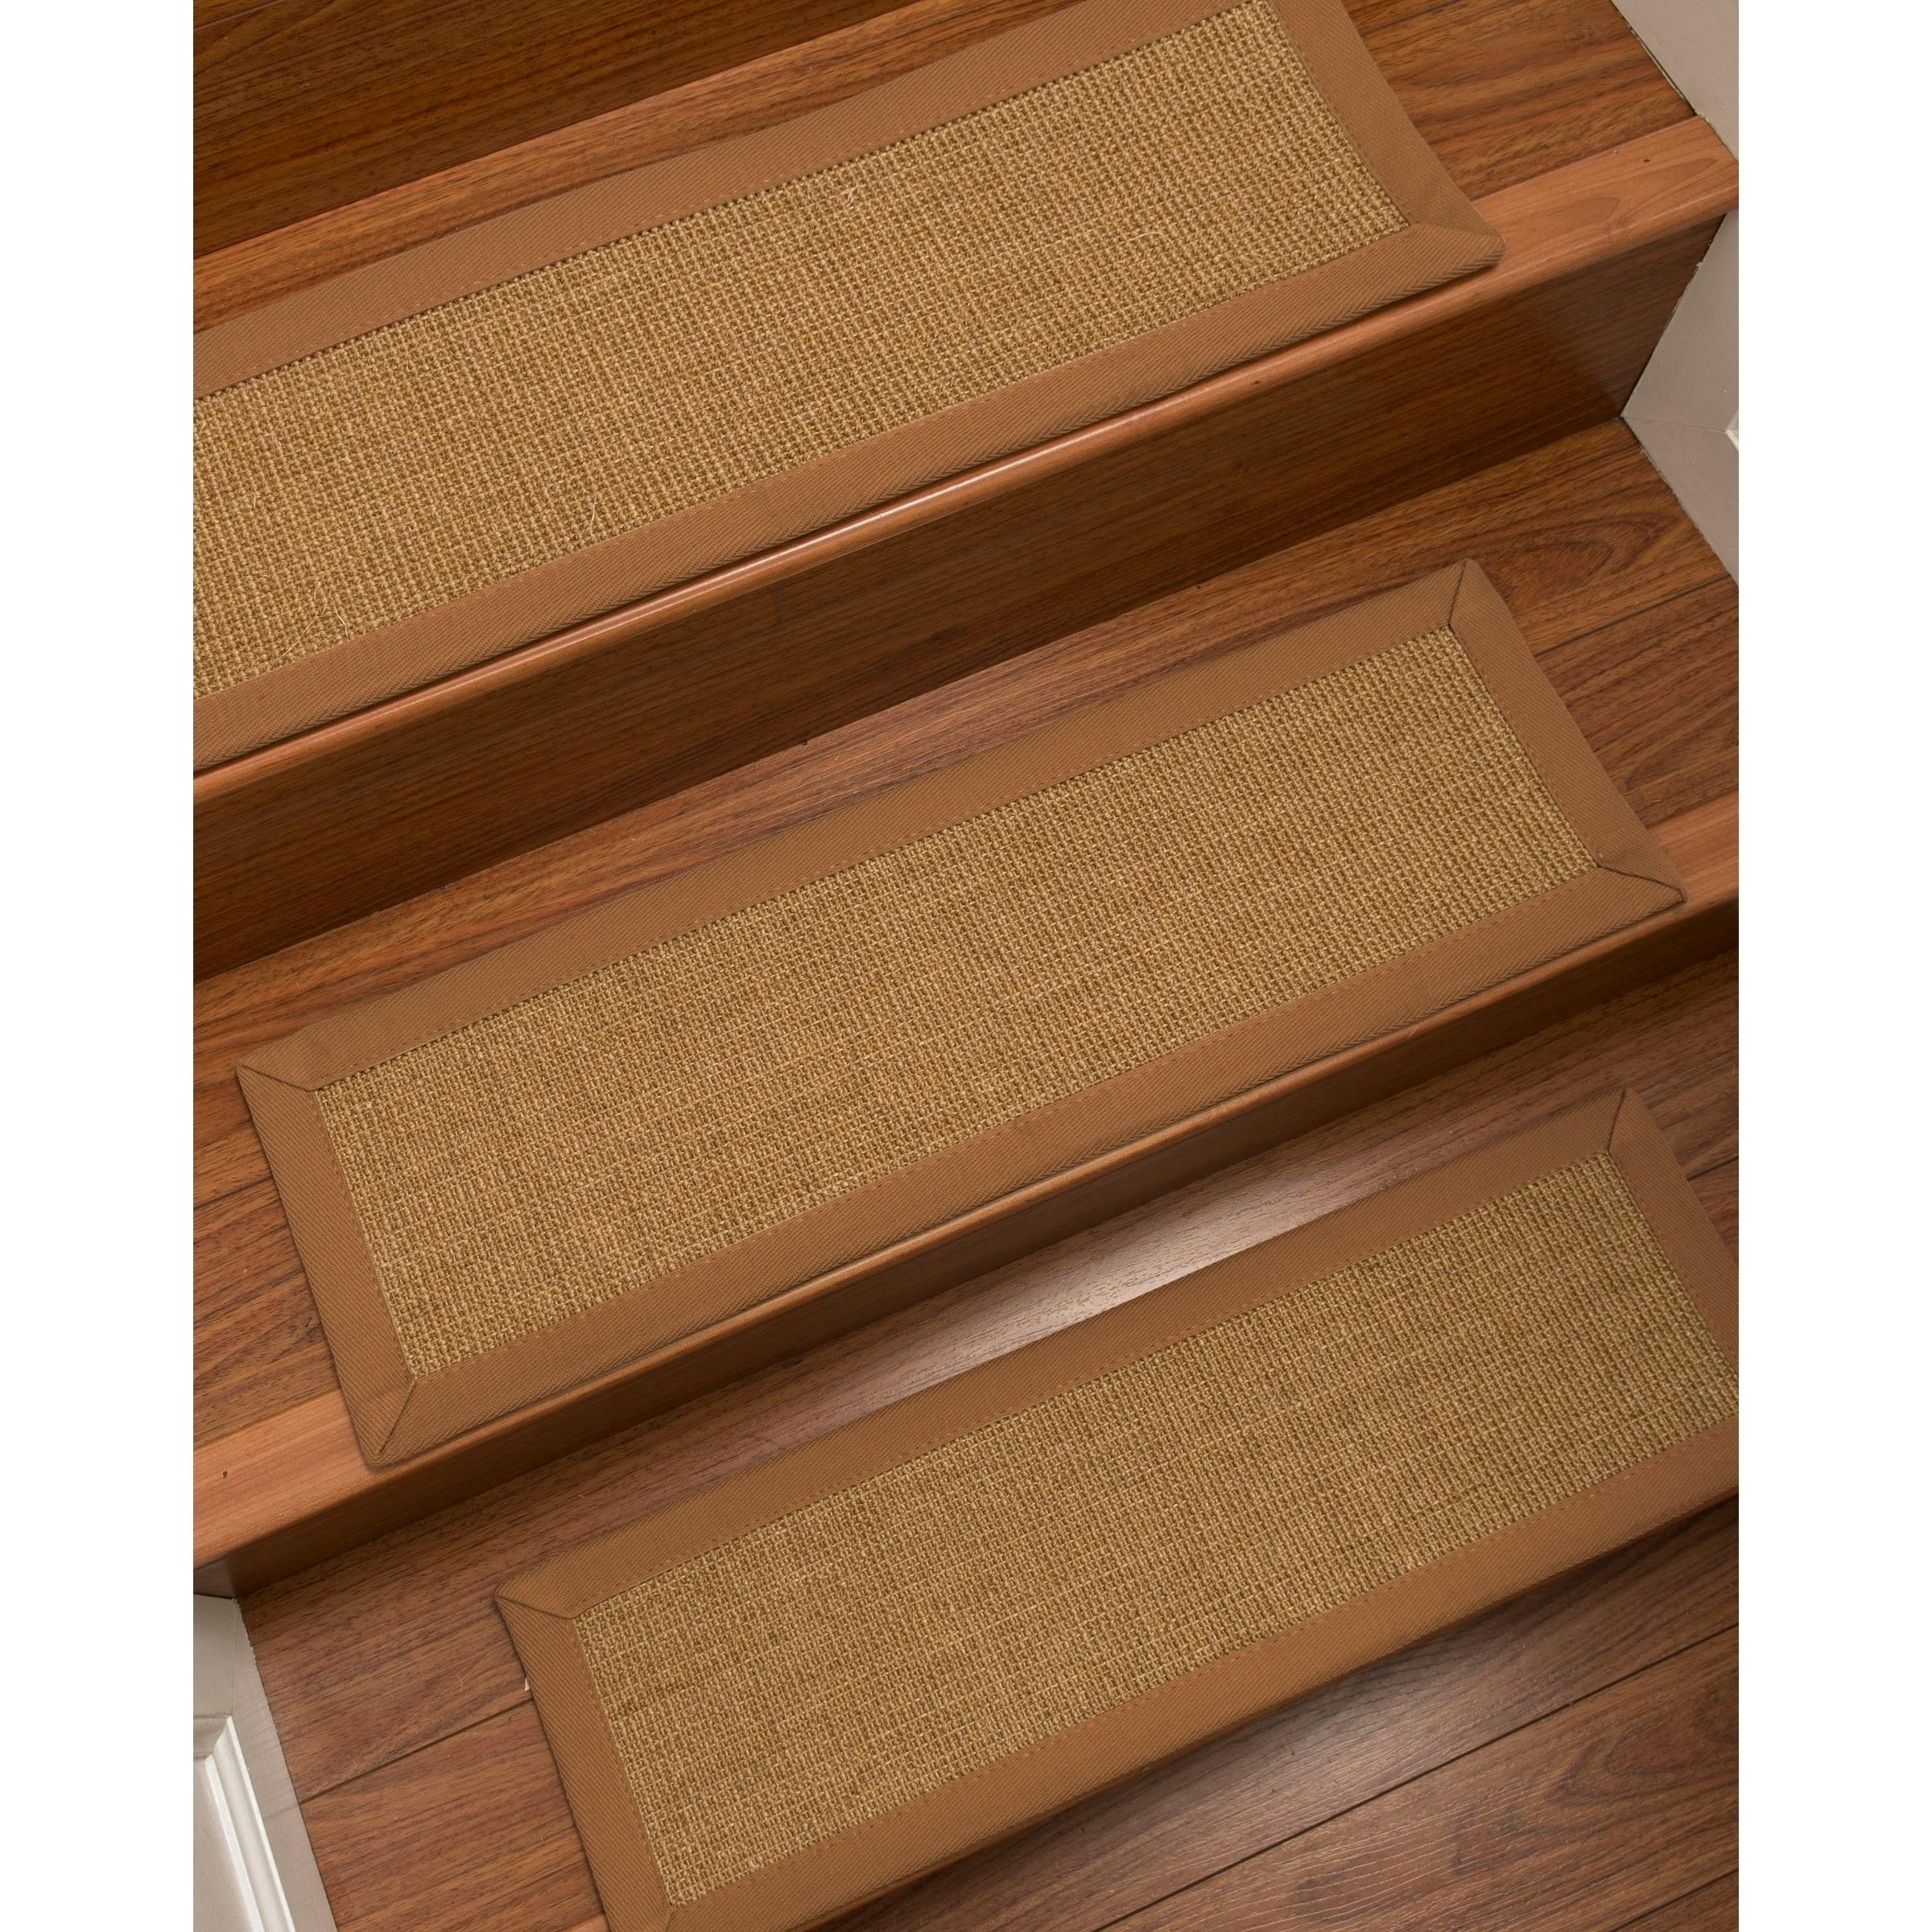 Shop Naturalarearugs Moda Carpet Stair Treads Set Of 13 9 X 29